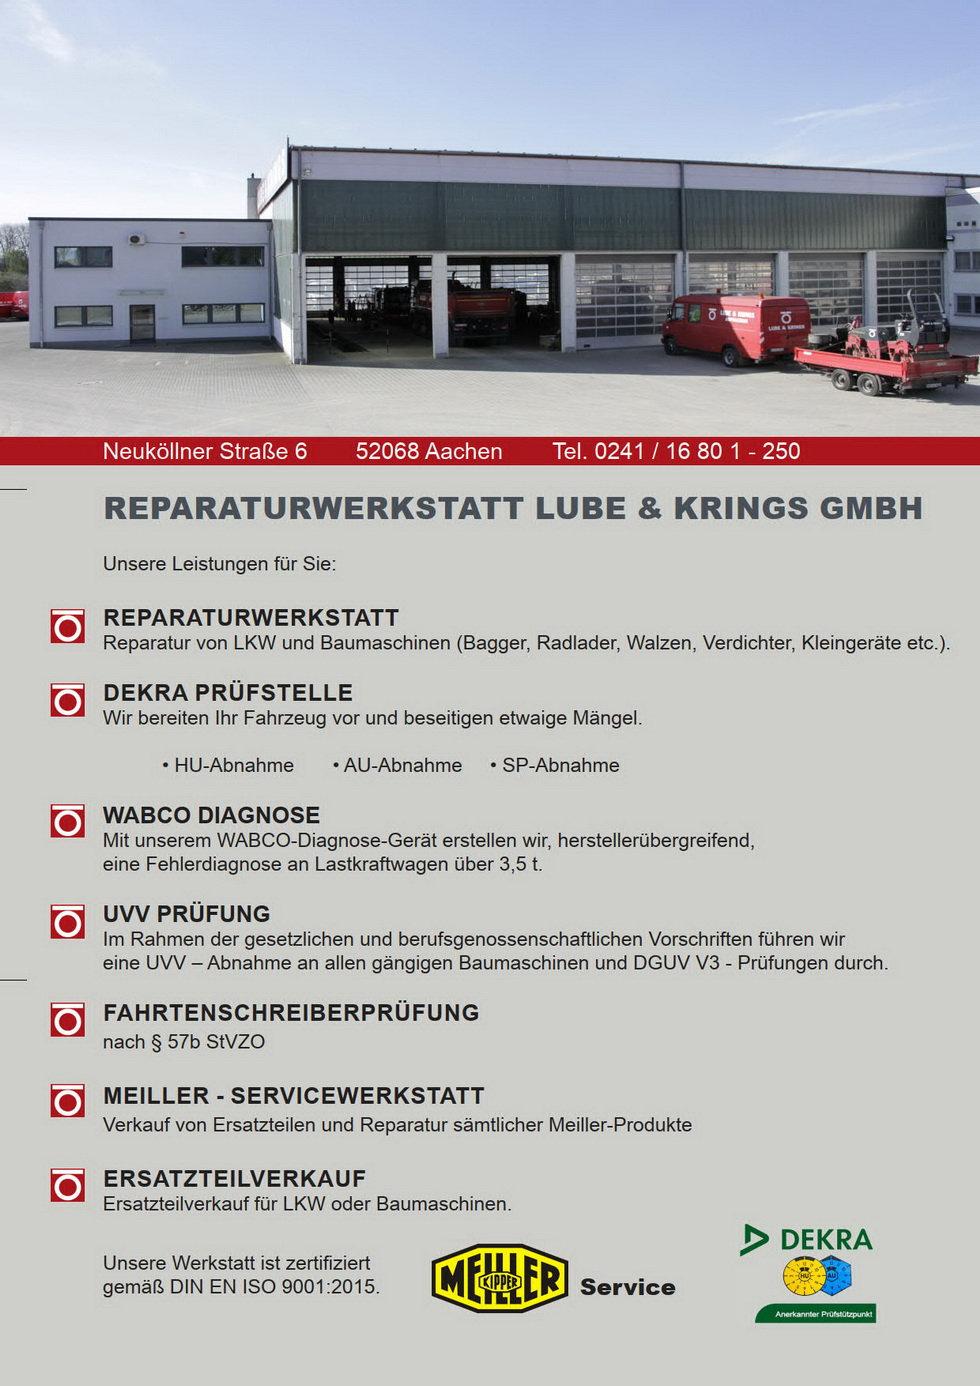 LUBE & KRINGS Werkstatt Flyer 1_2.jpg